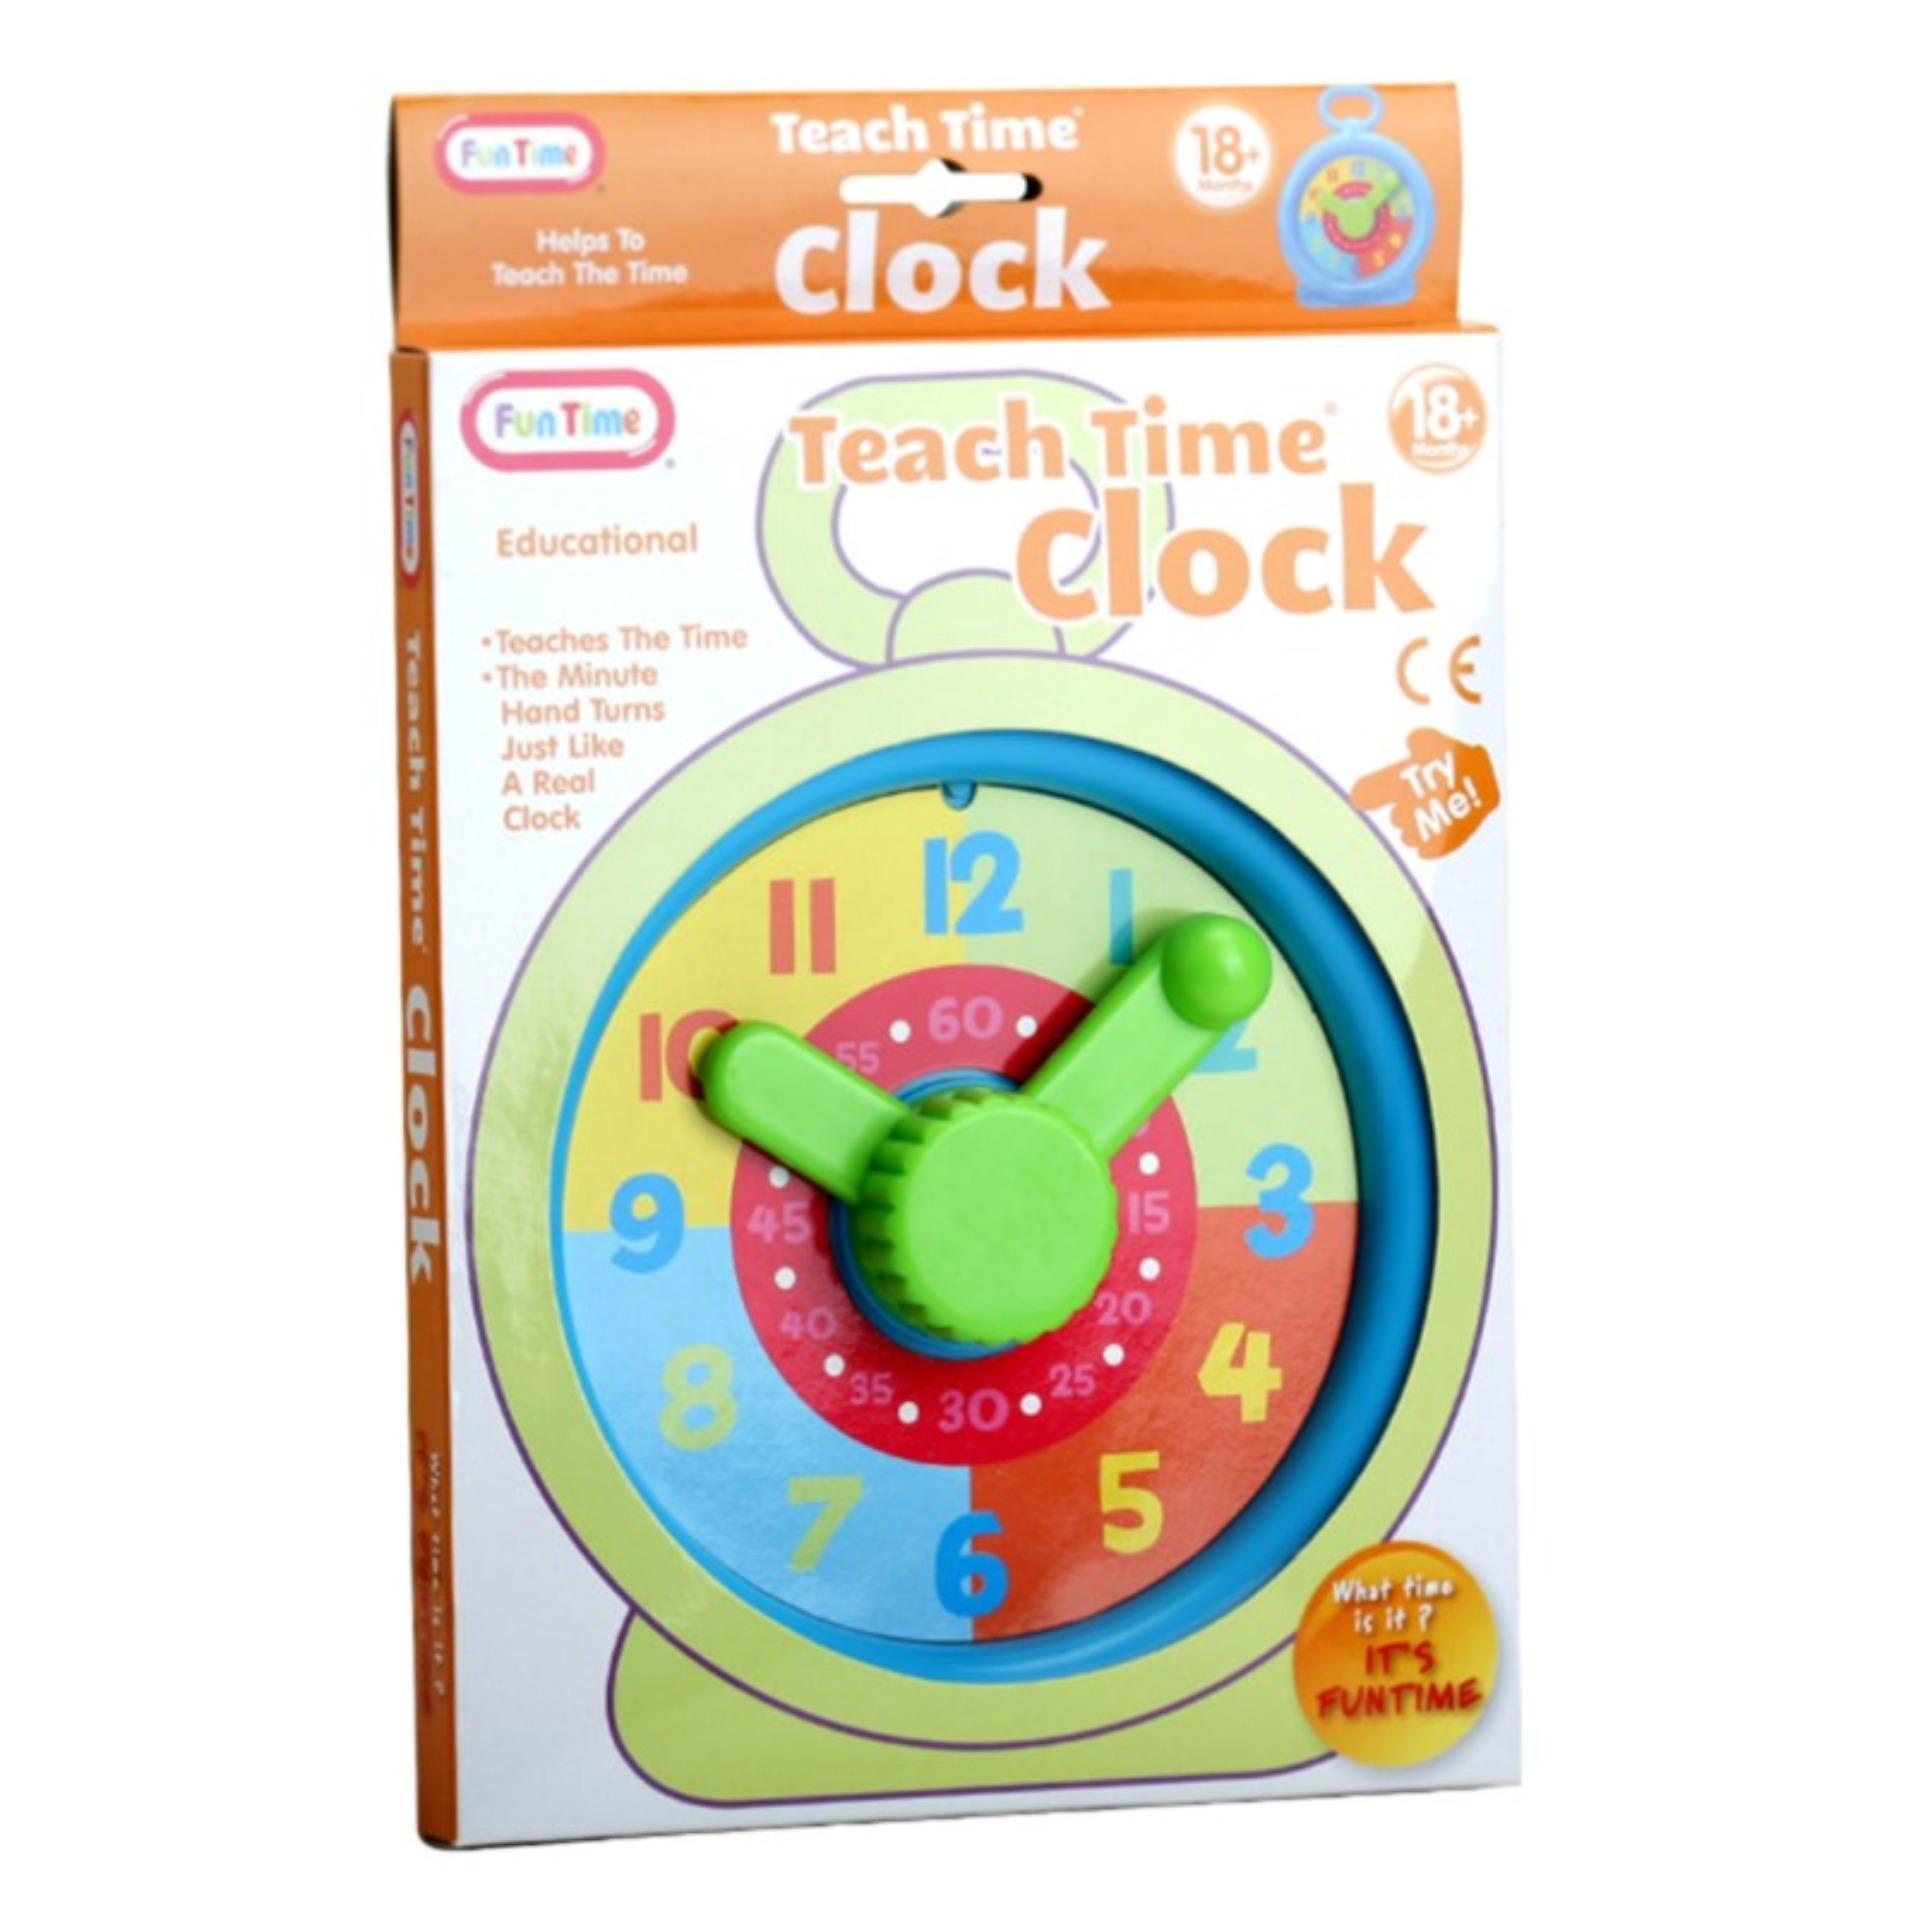 Teaching Clocks - Buy Teaching Clocks at Best Price in Singapore